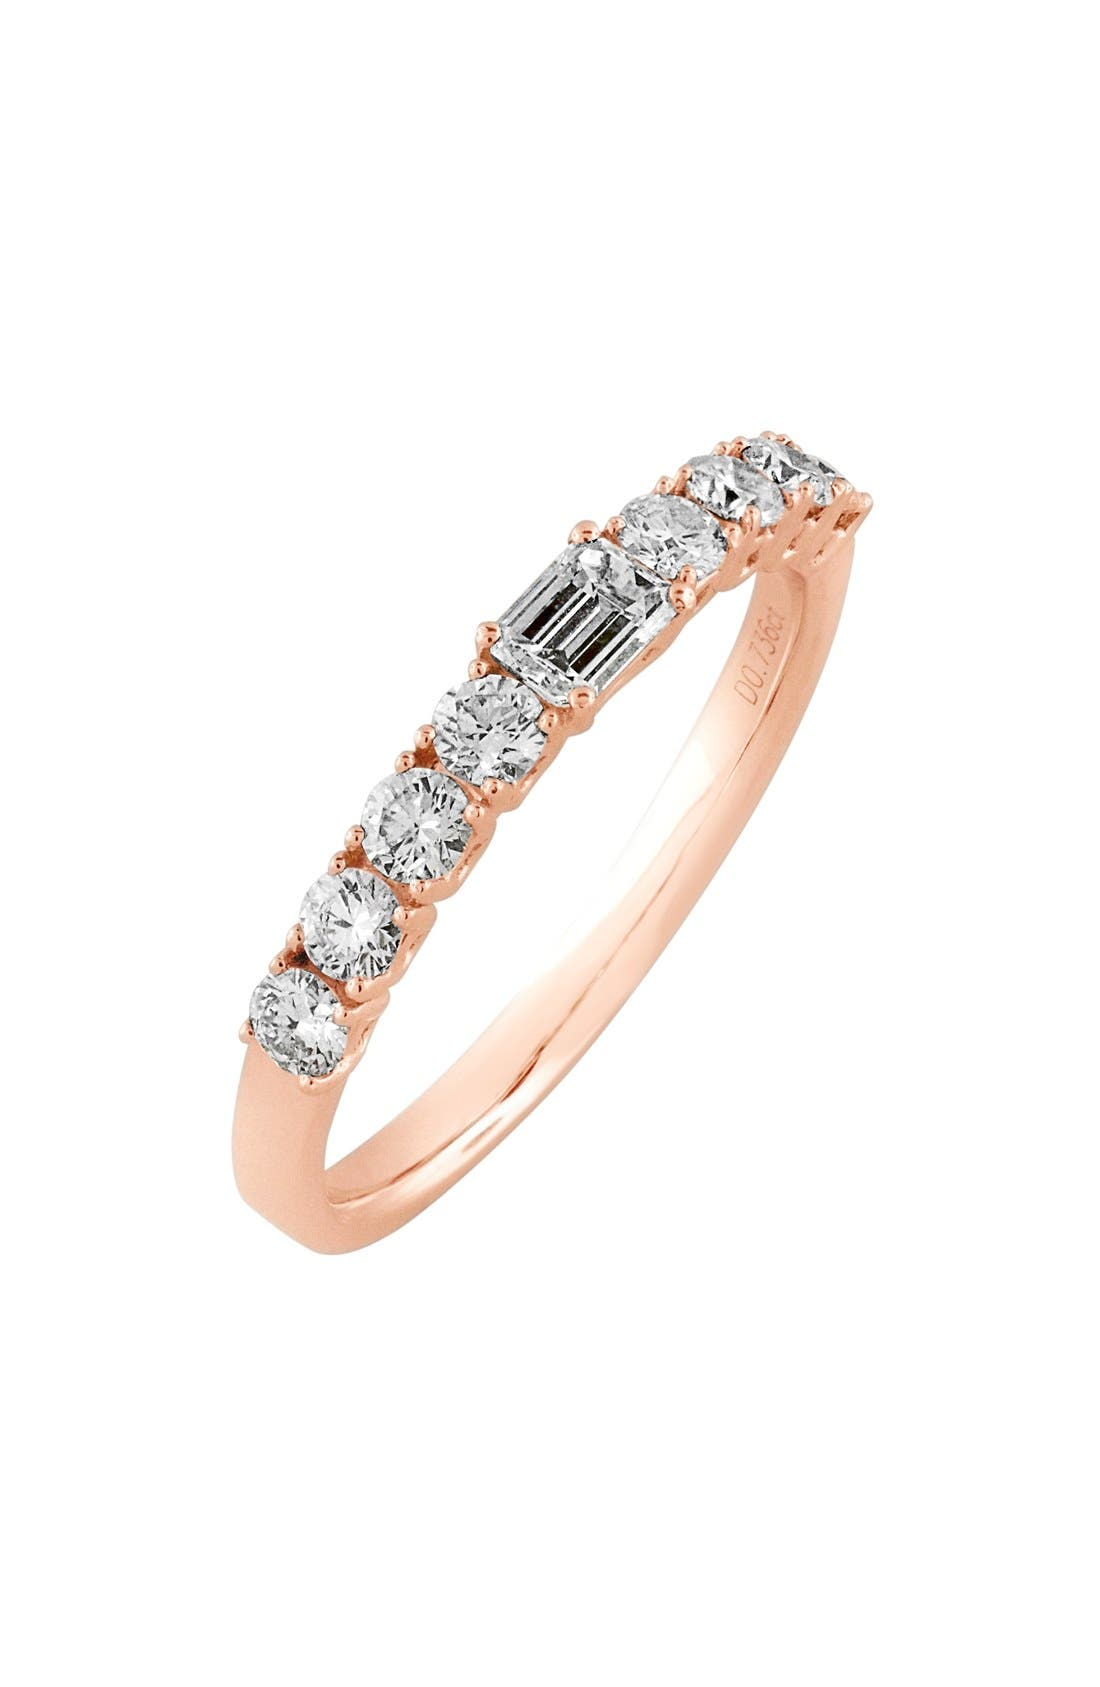 'Liora' Stackable Emerald Cut Diamond Ring,                             Main thumbnail 1, color,                             Rose Gold